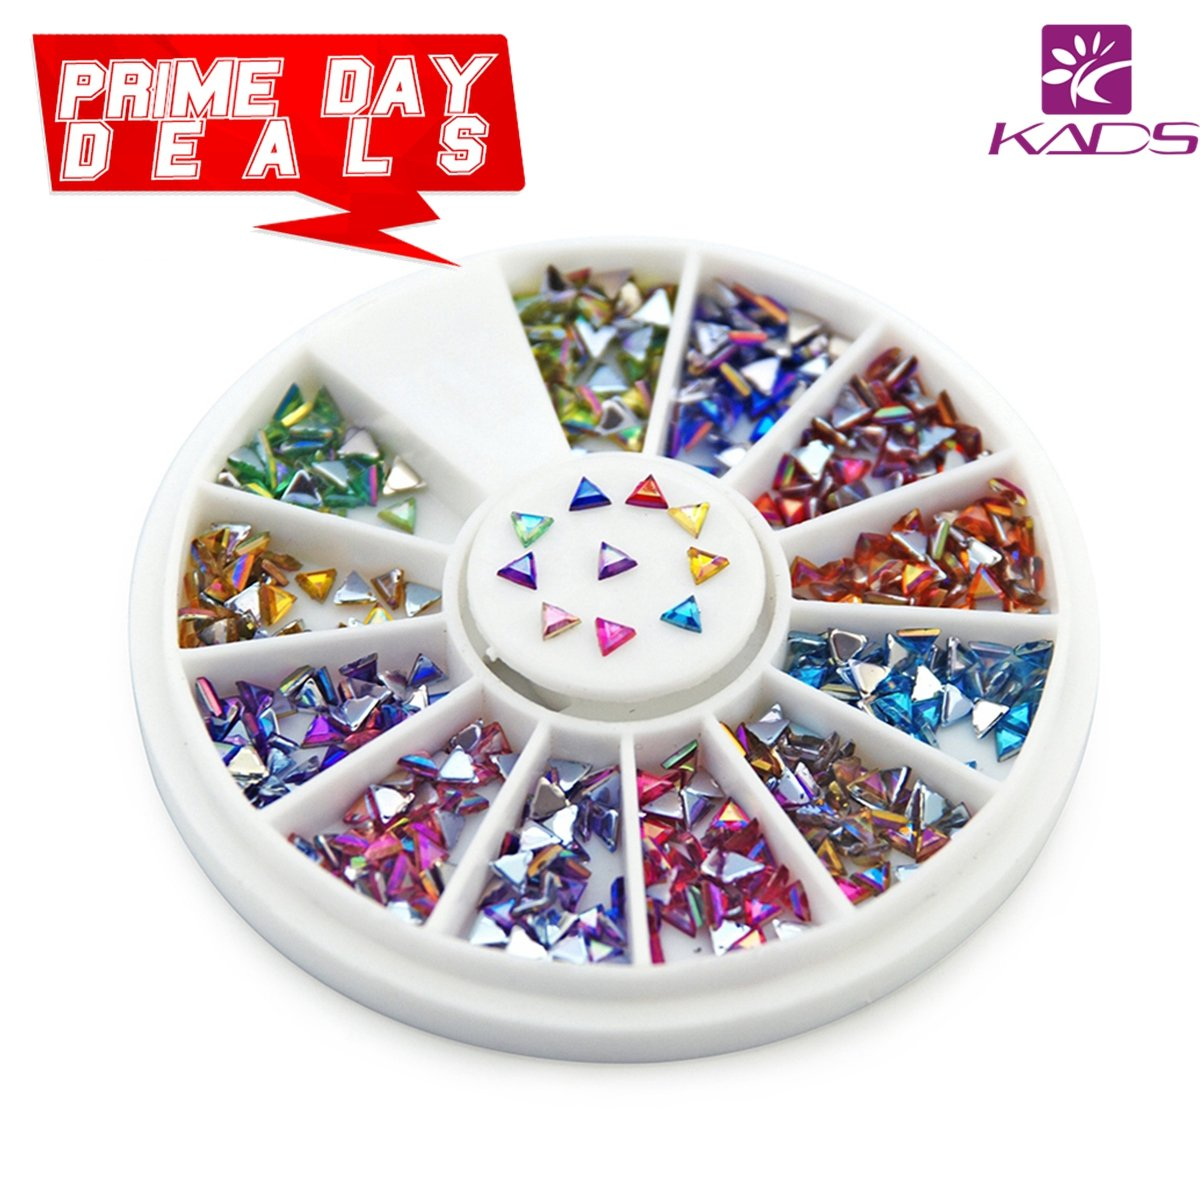 KADS AB 3*6MM Nail Art Studs Tear Colorful Rhinestones 120 Piece 12 Color Nail Art Manicure Wheels KADS Co. Ltd